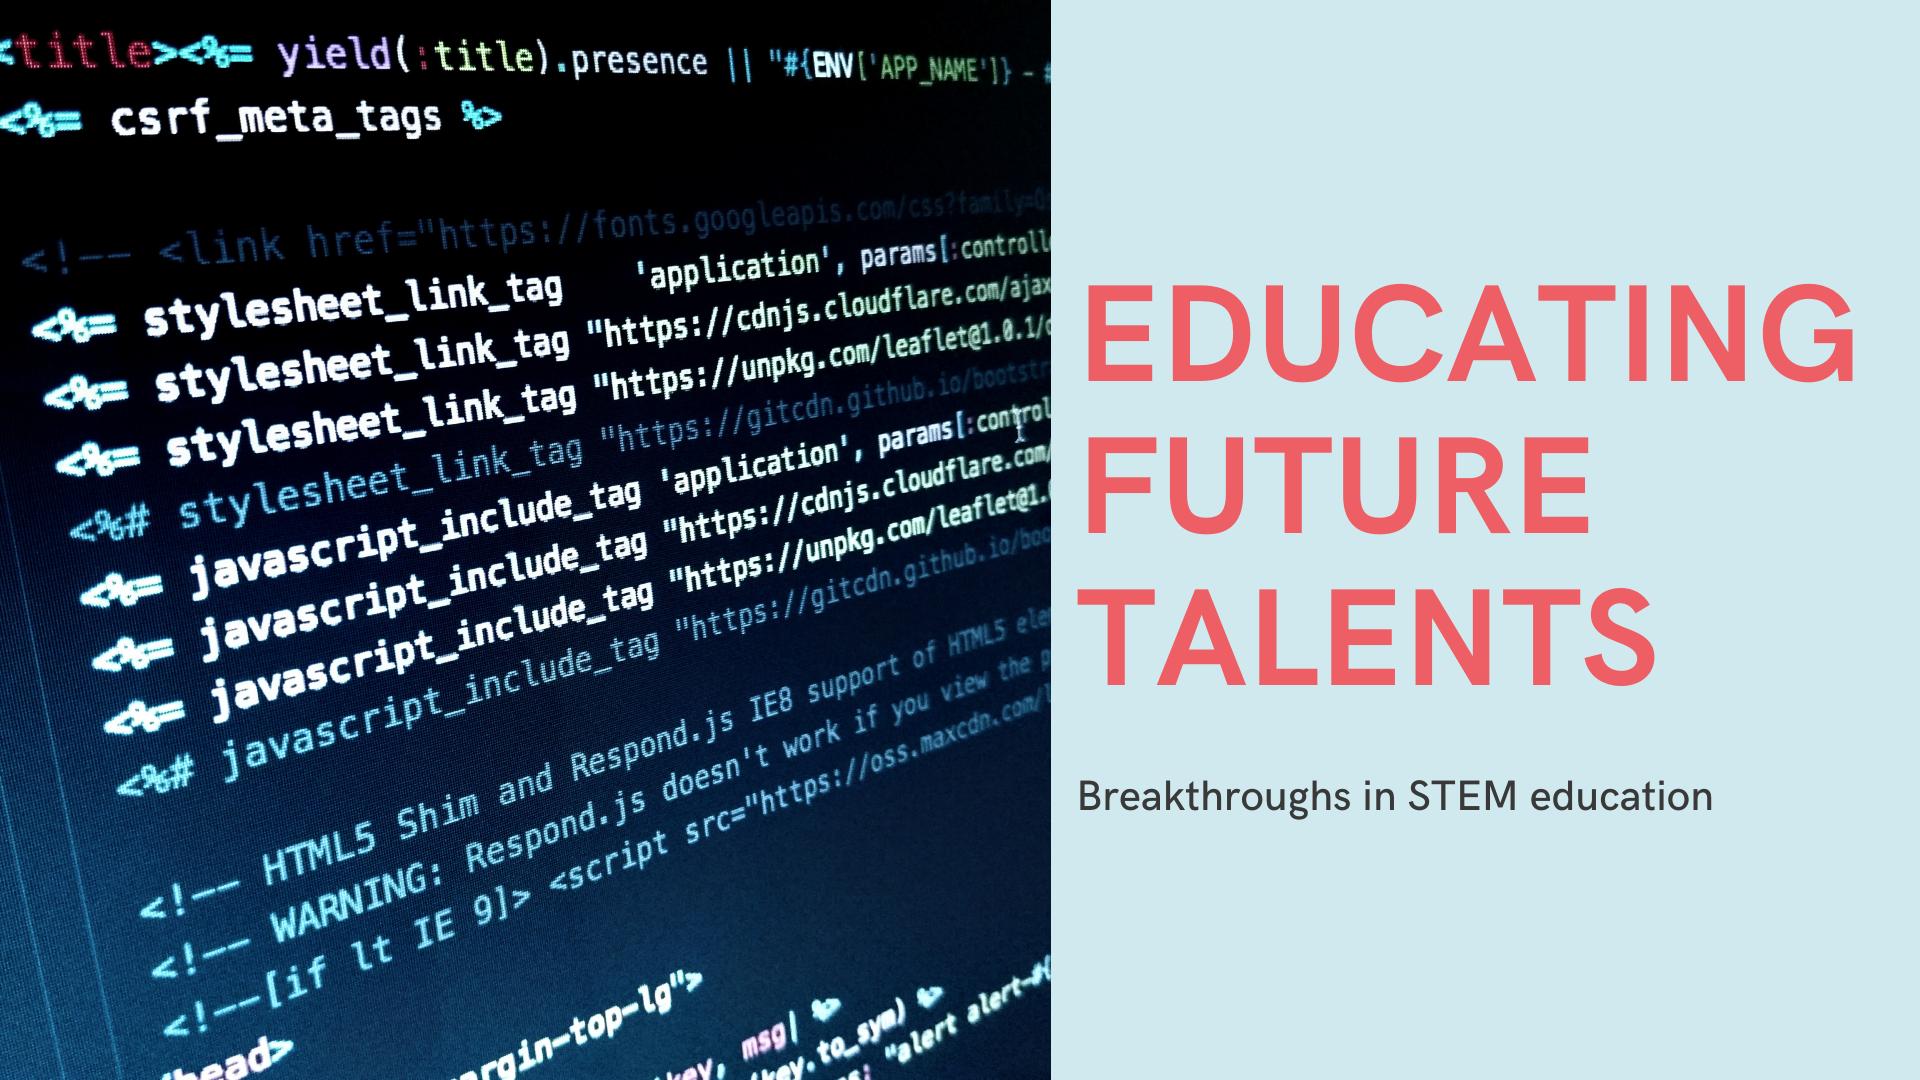 Educating future talents (1)